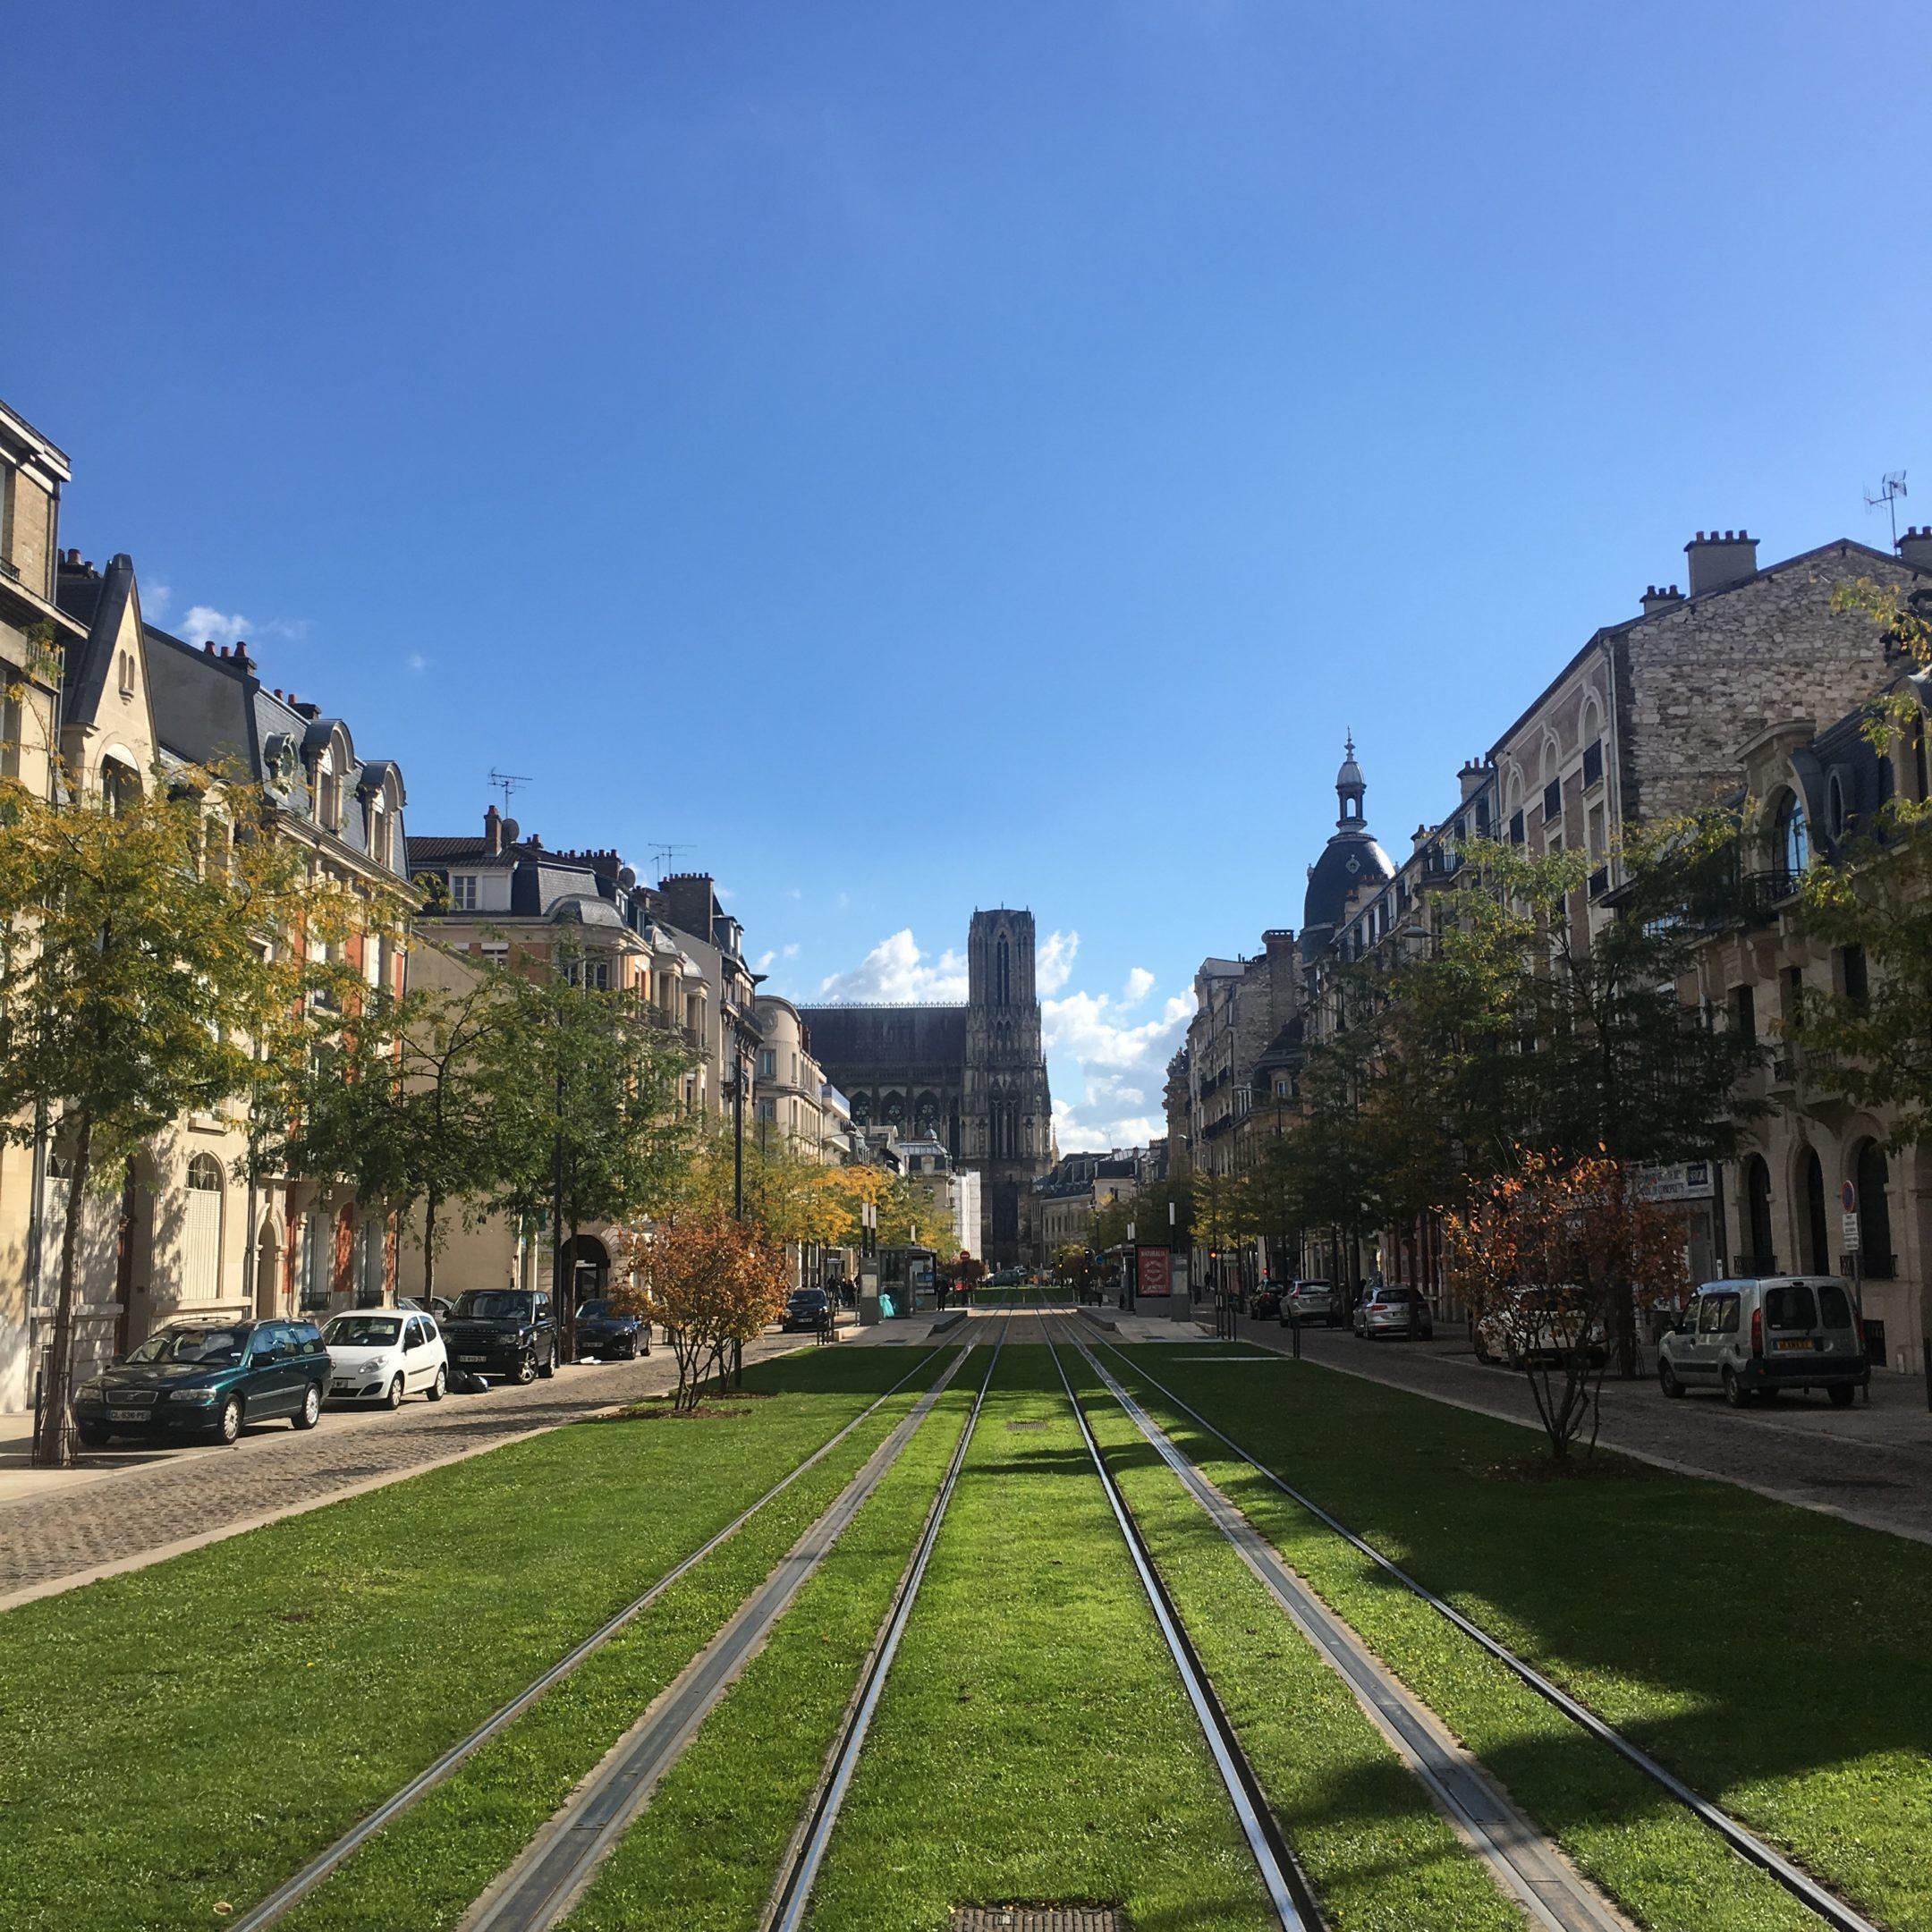 The Best of Reims with Reims Tourism - Au Beau Sarrazin